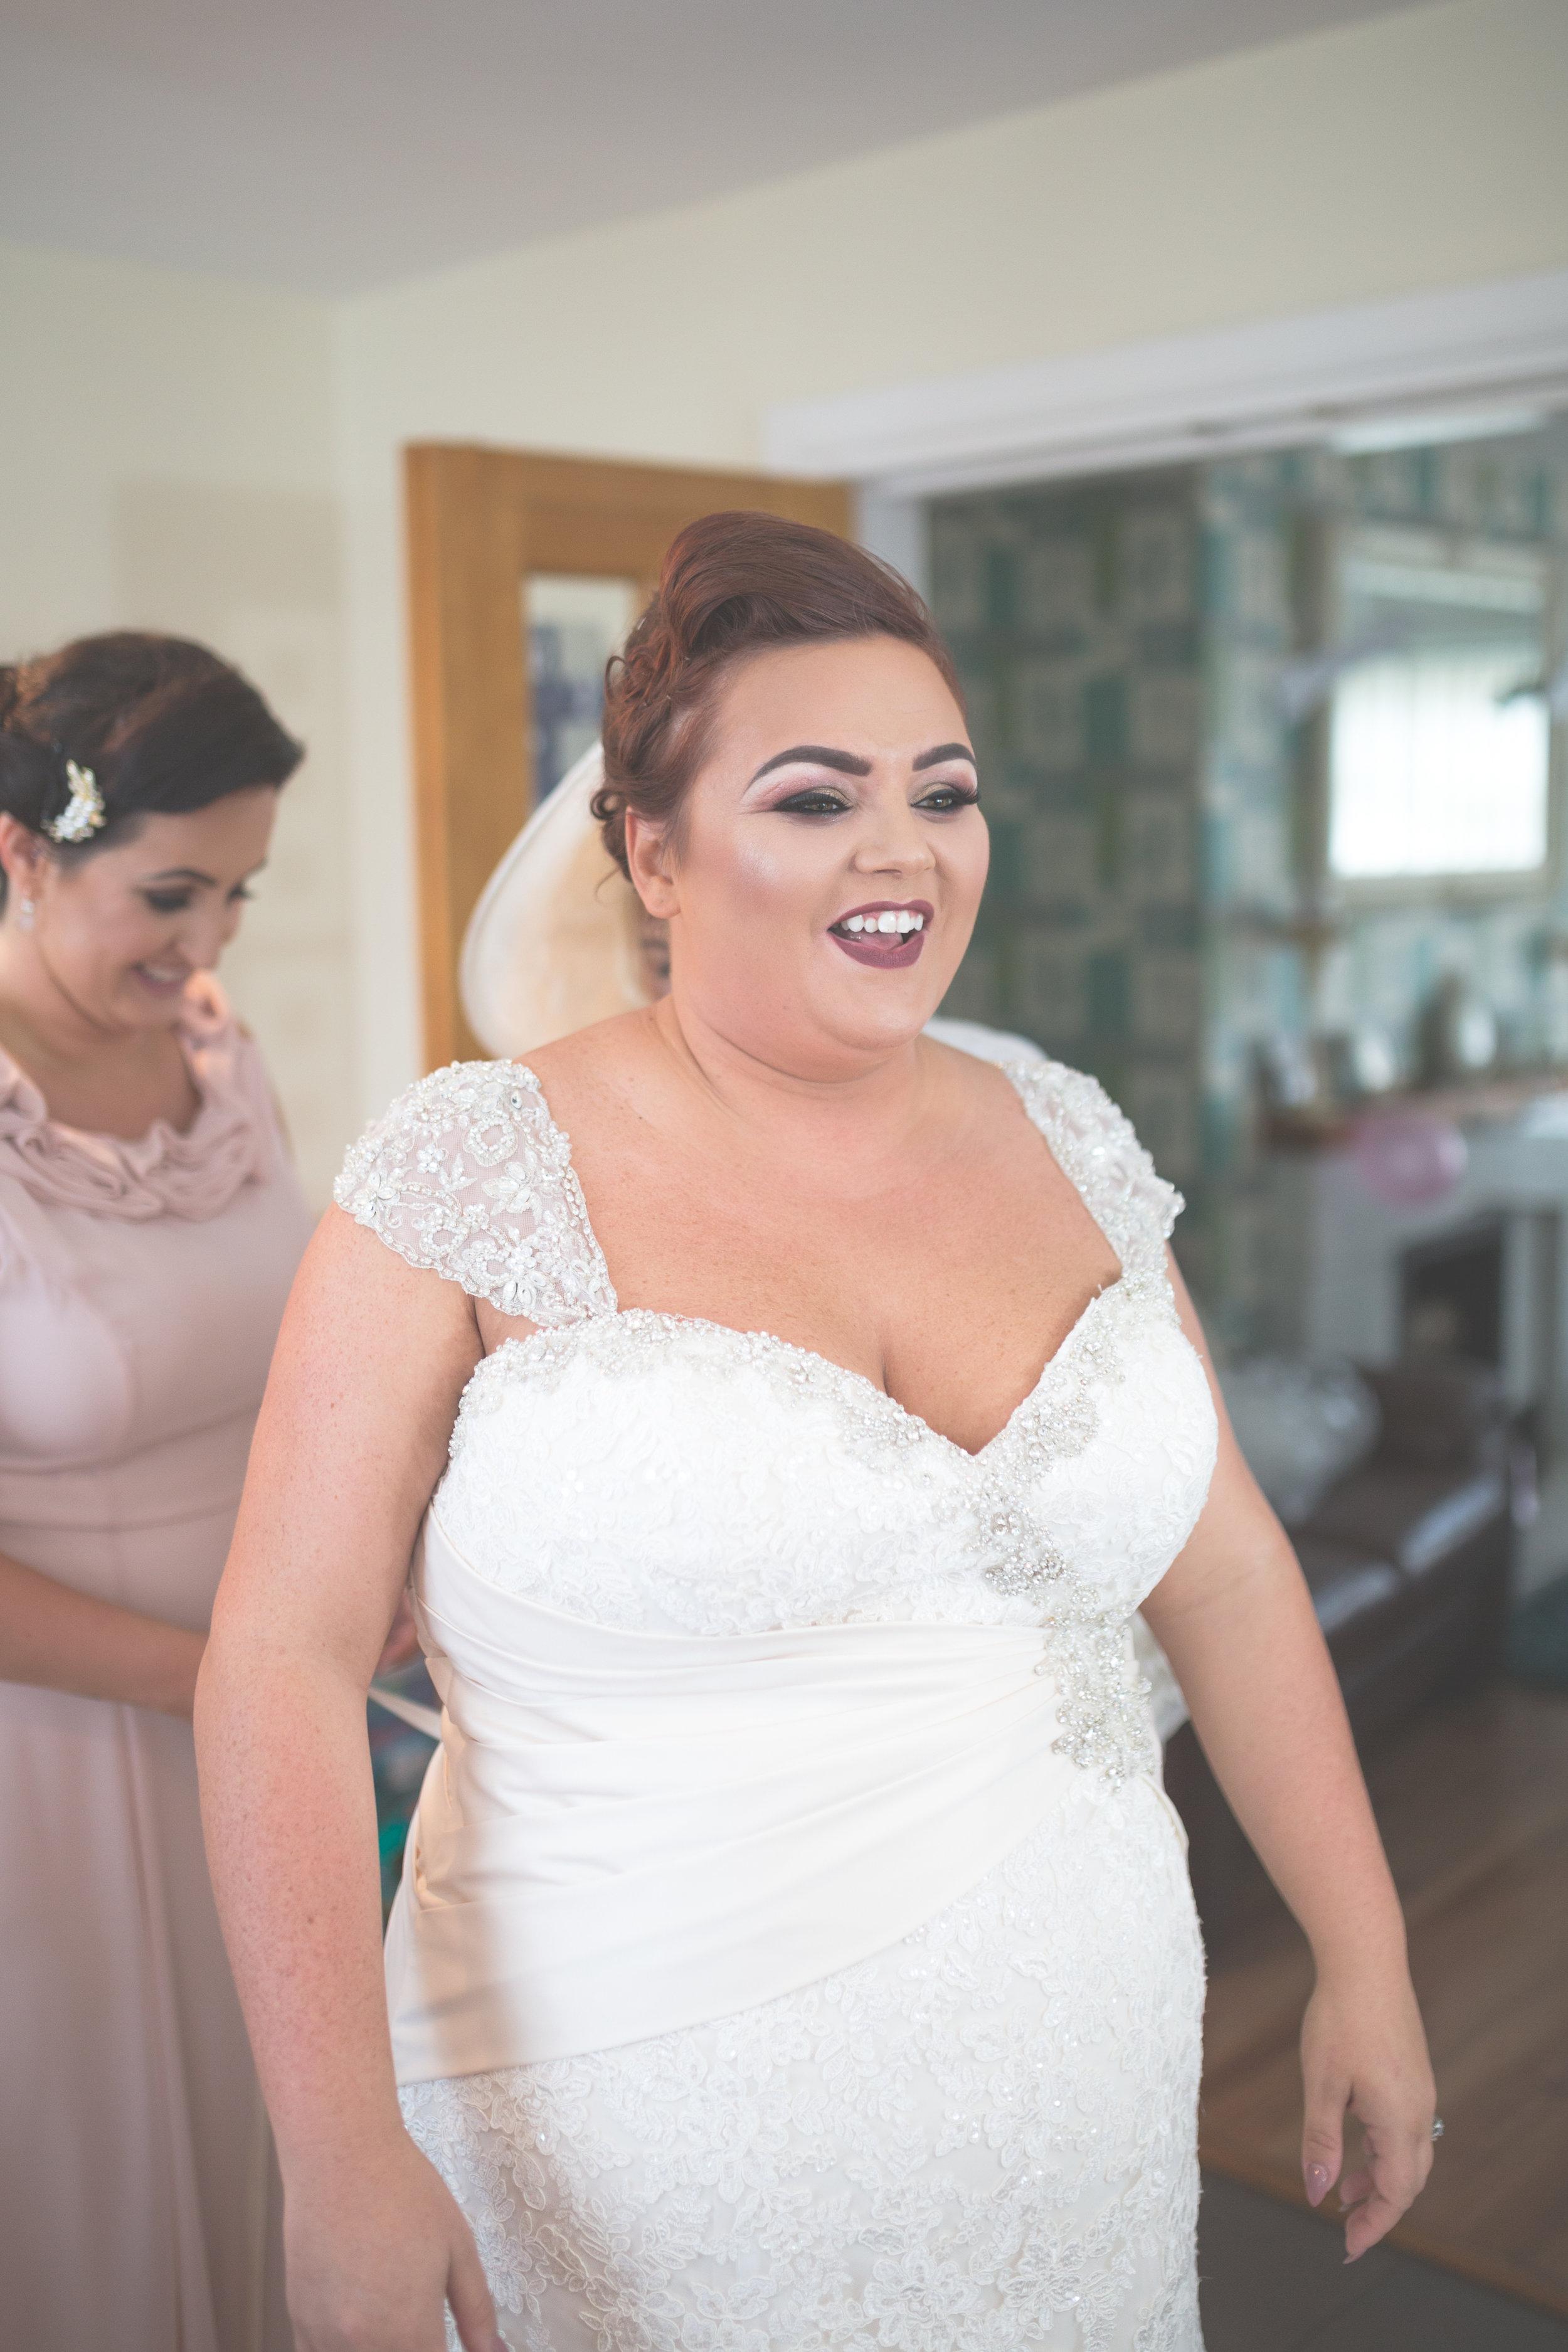 Antoinette & Stephen - Bridal Preparations | Brian McEwan Photography | Wedding Photographer Northern Ireland 144.jpg